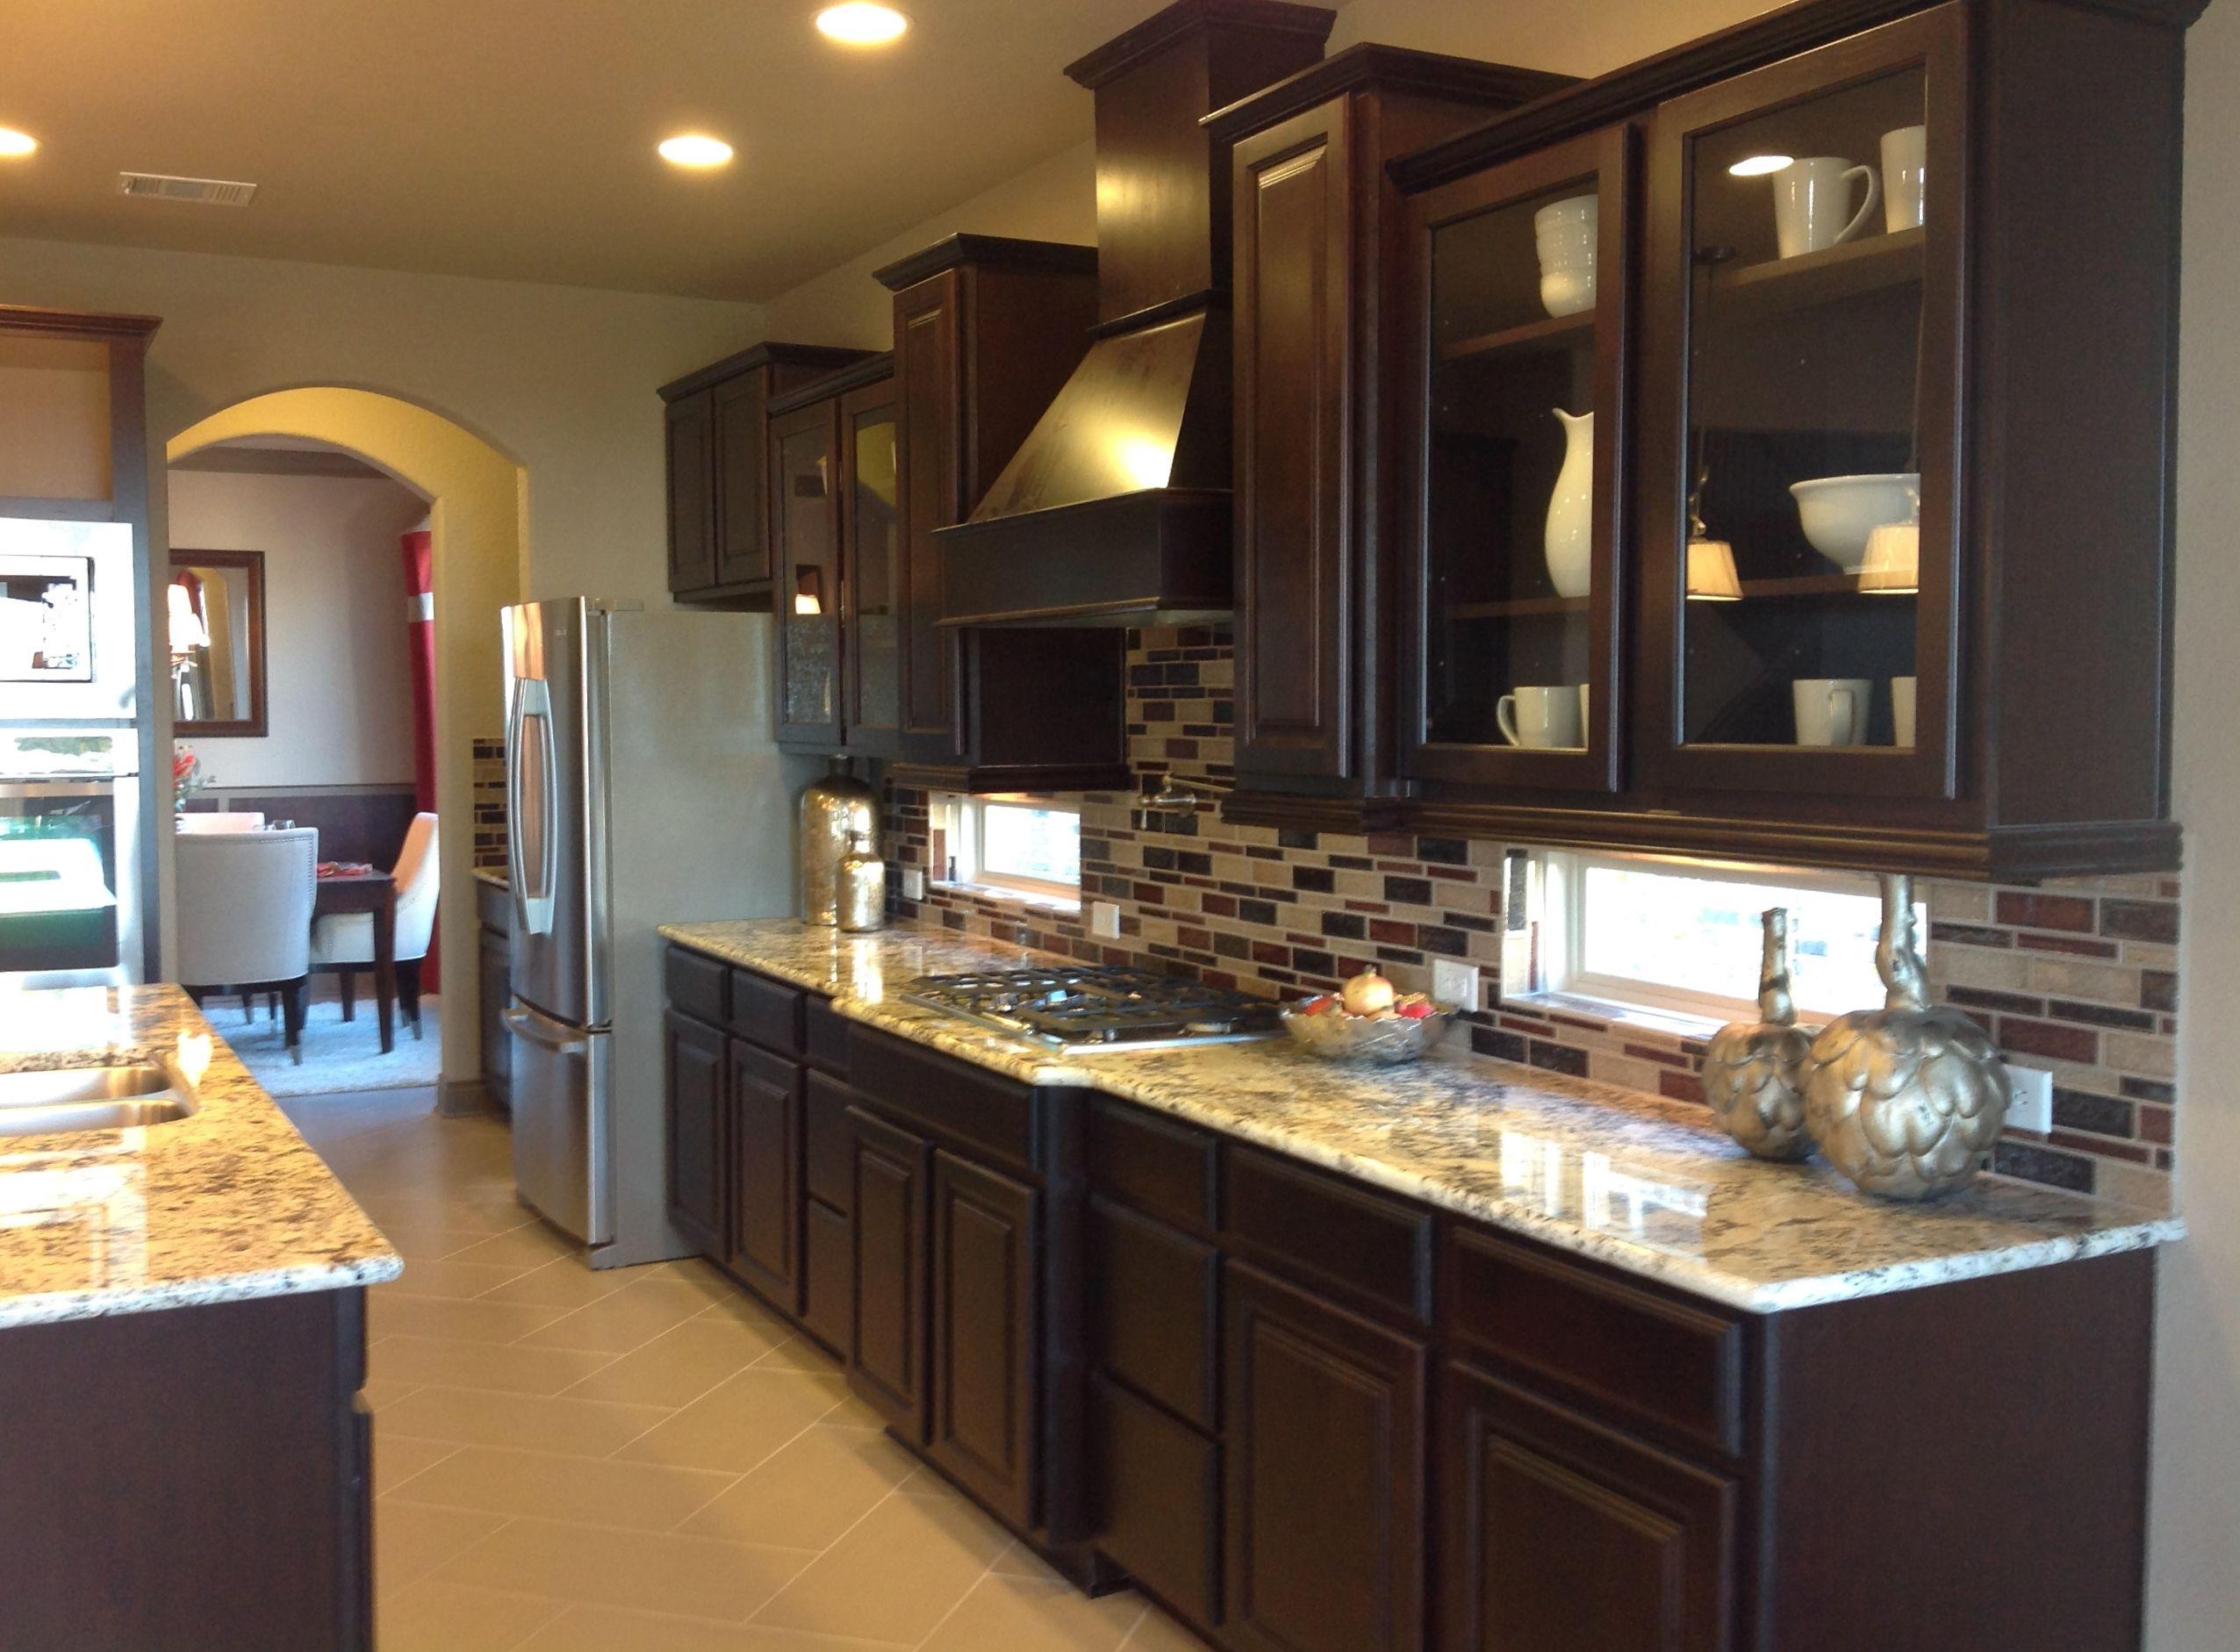 Ashton Woods Kitchens  Ashton Woods Homes Include Designer Magnificent Designer Kitchen Decorating Design